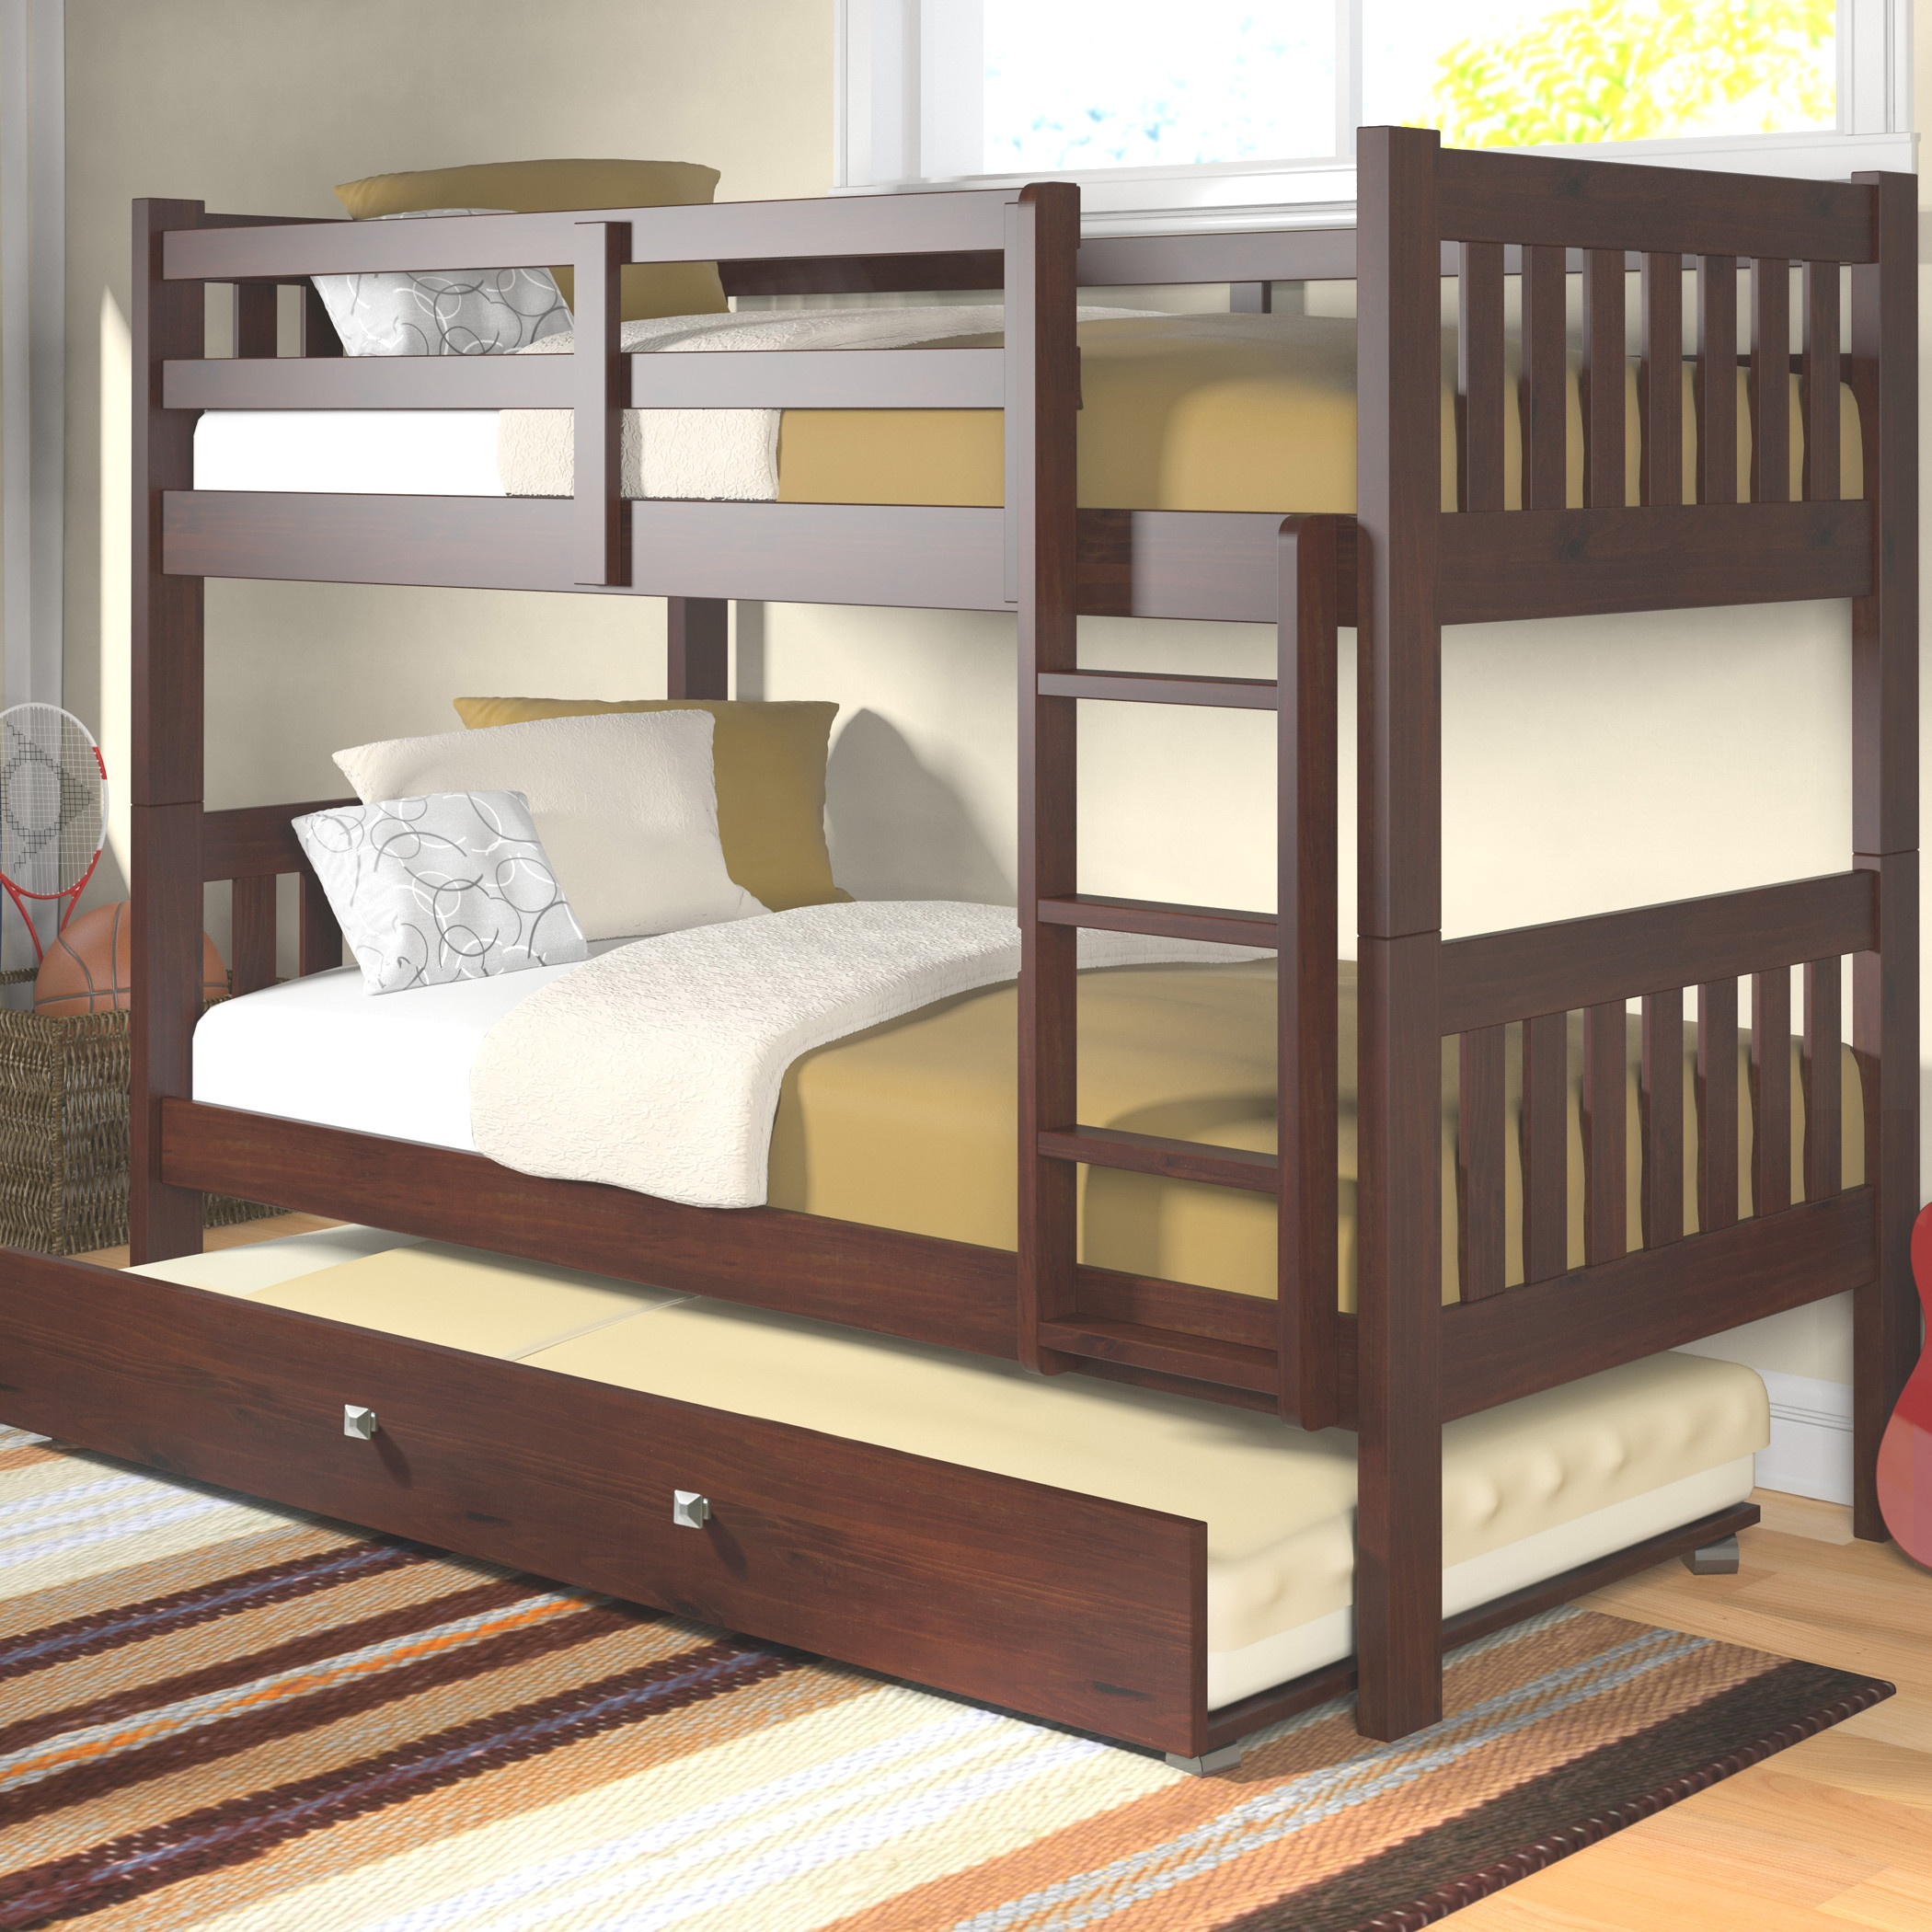 Bunk Bedideas: The Hidden Agenda Of Twin Bunk Bed Plans